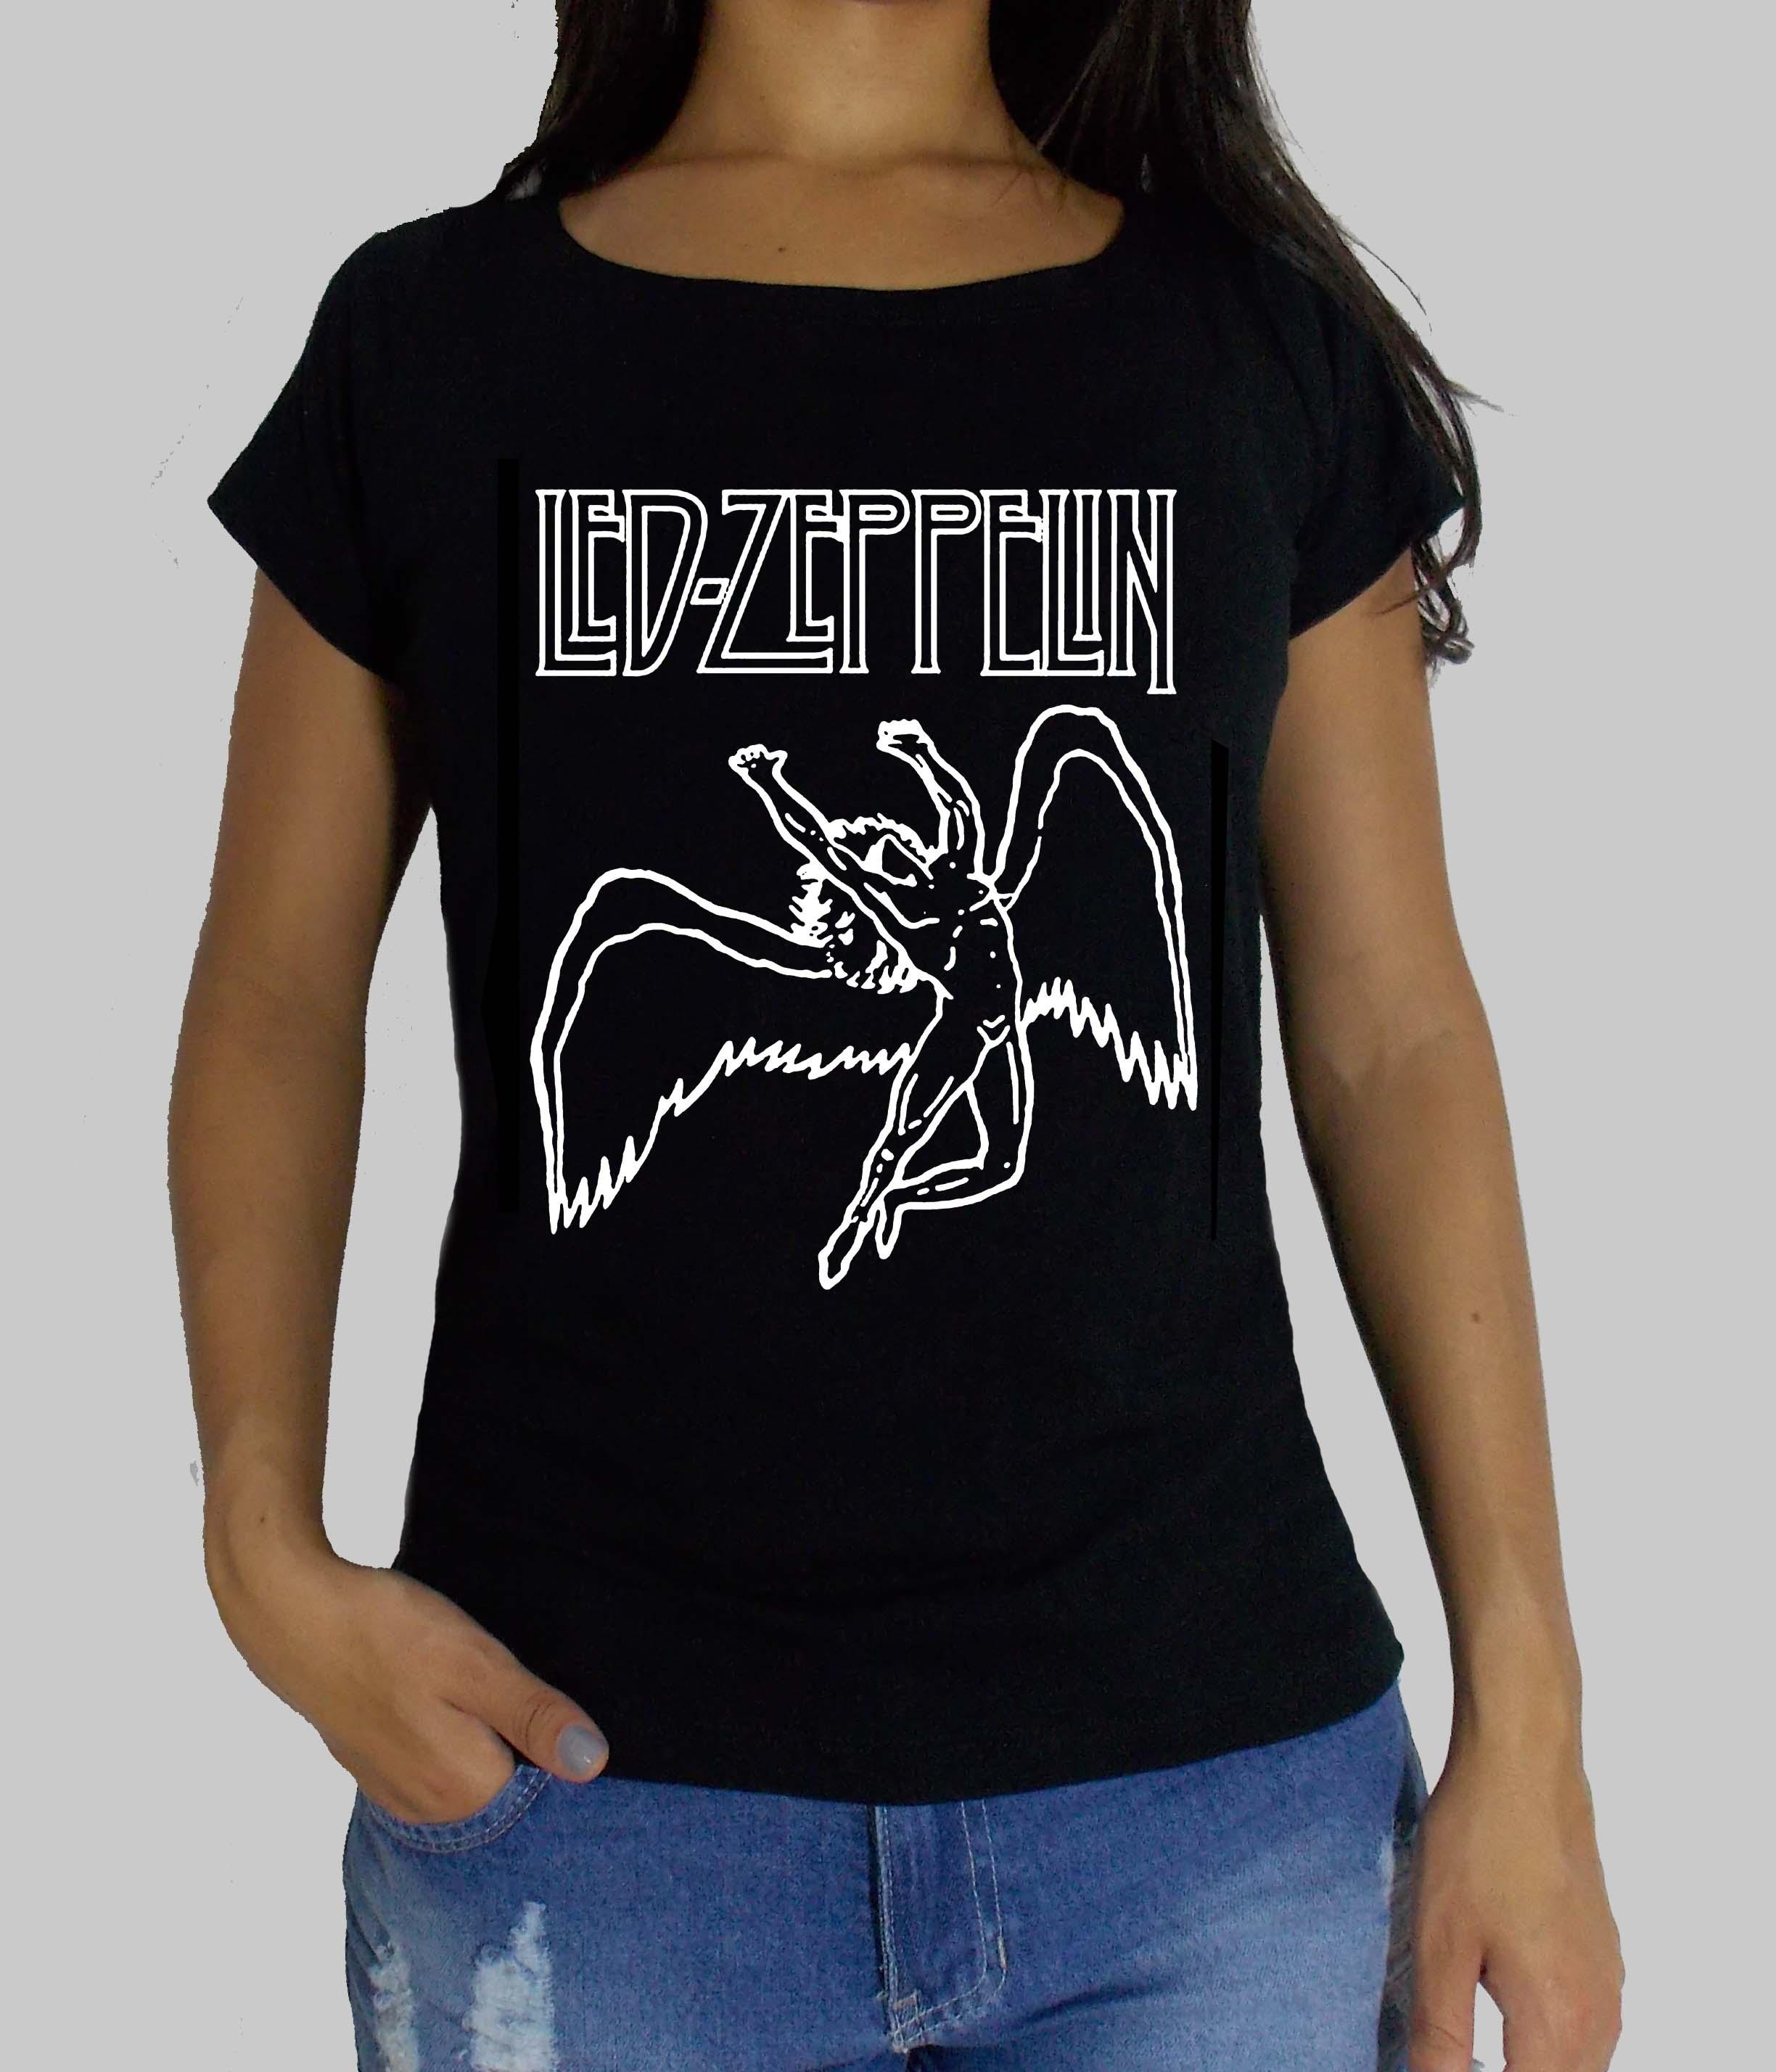 b5446b61d Camiseta Feminina Nirvana em Strass no Elo7